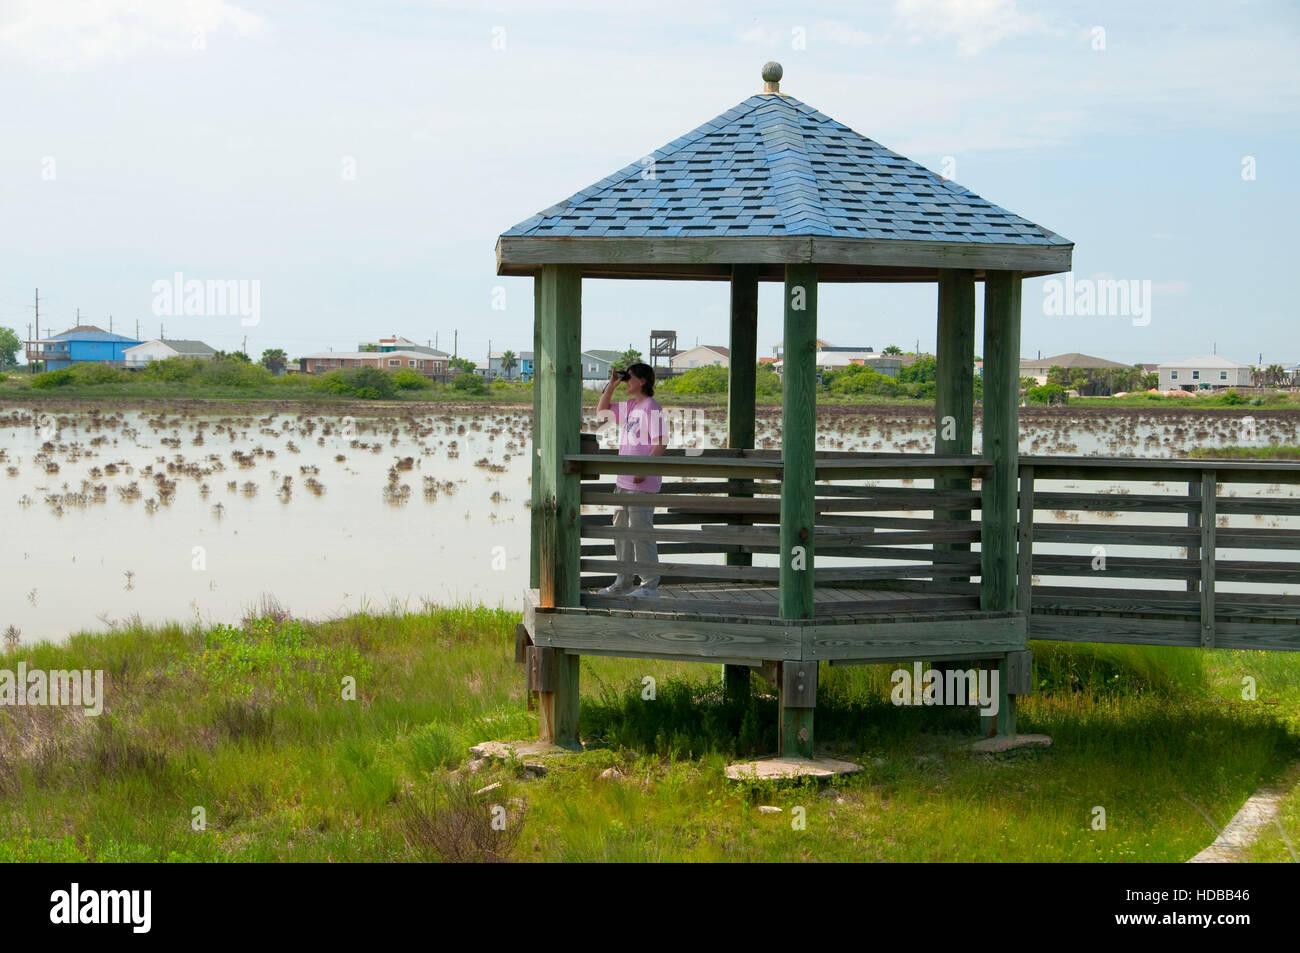 Viewing shelter, Port Aransas Wetland Park, Aransas Pass, Texas - Stock Image